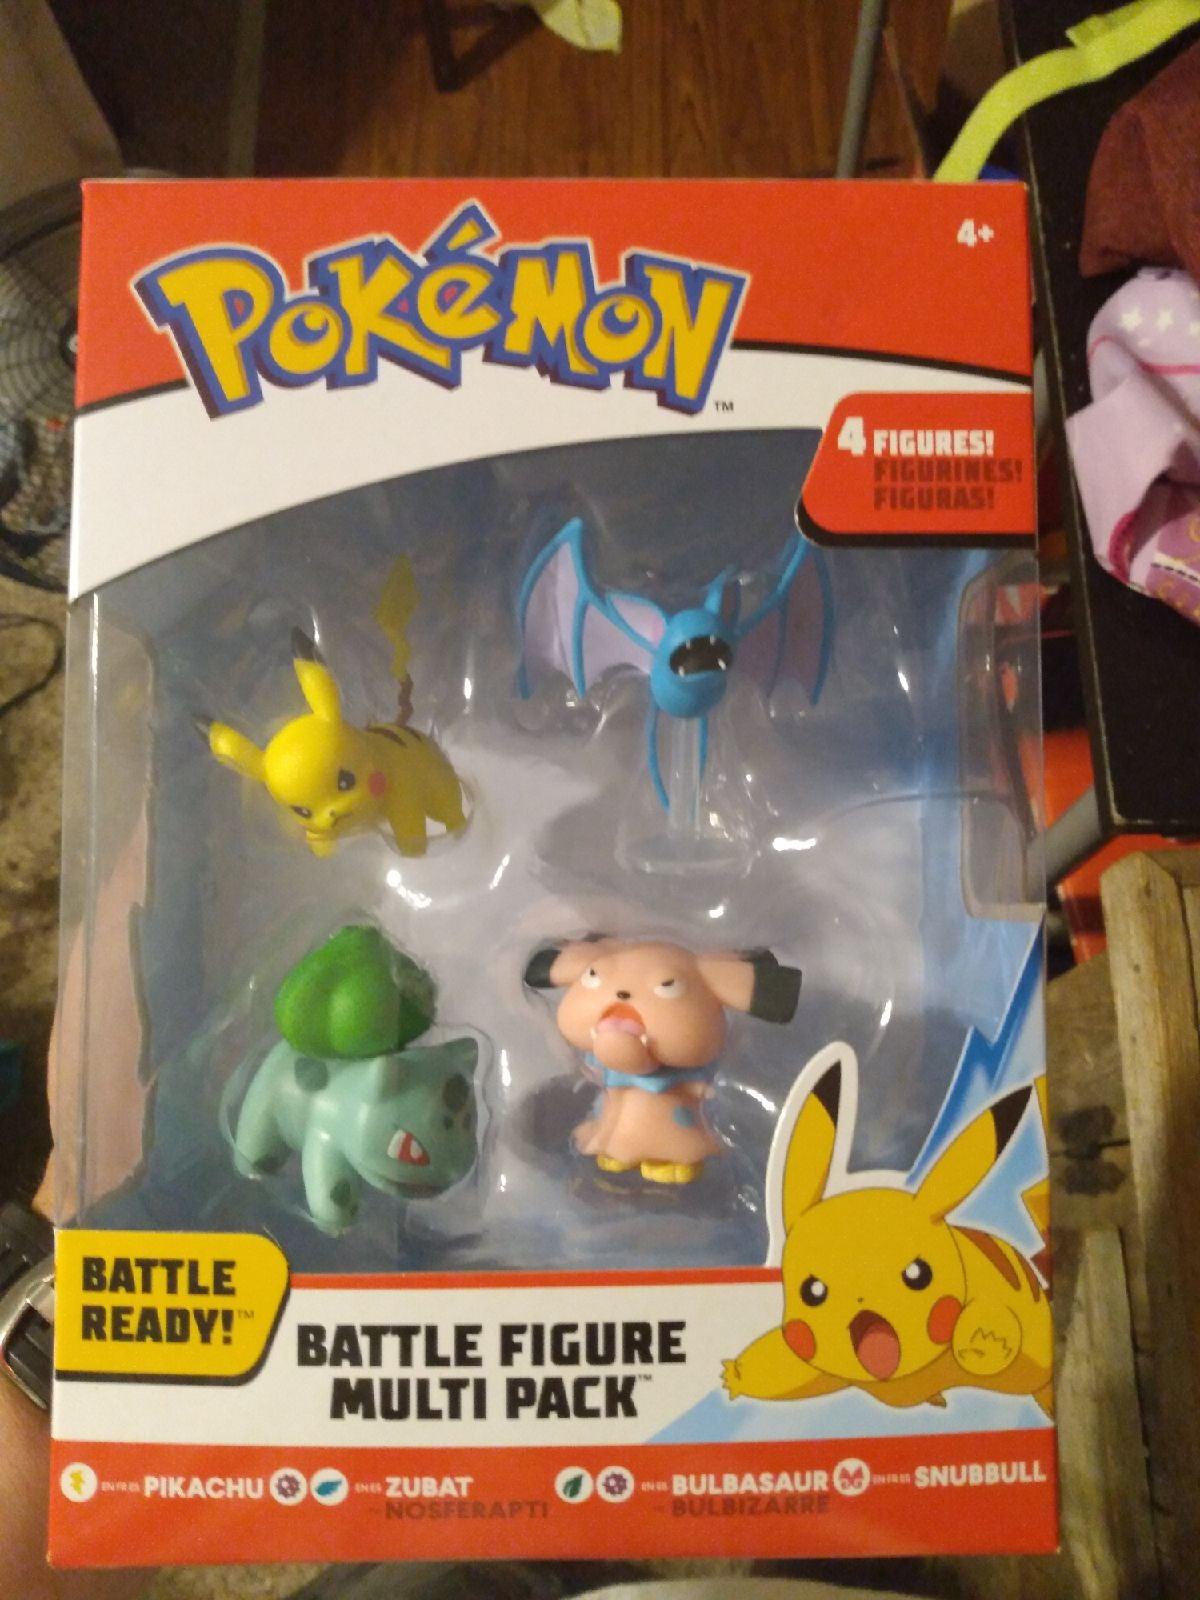 Pokemon Battle Figure Multi Pack